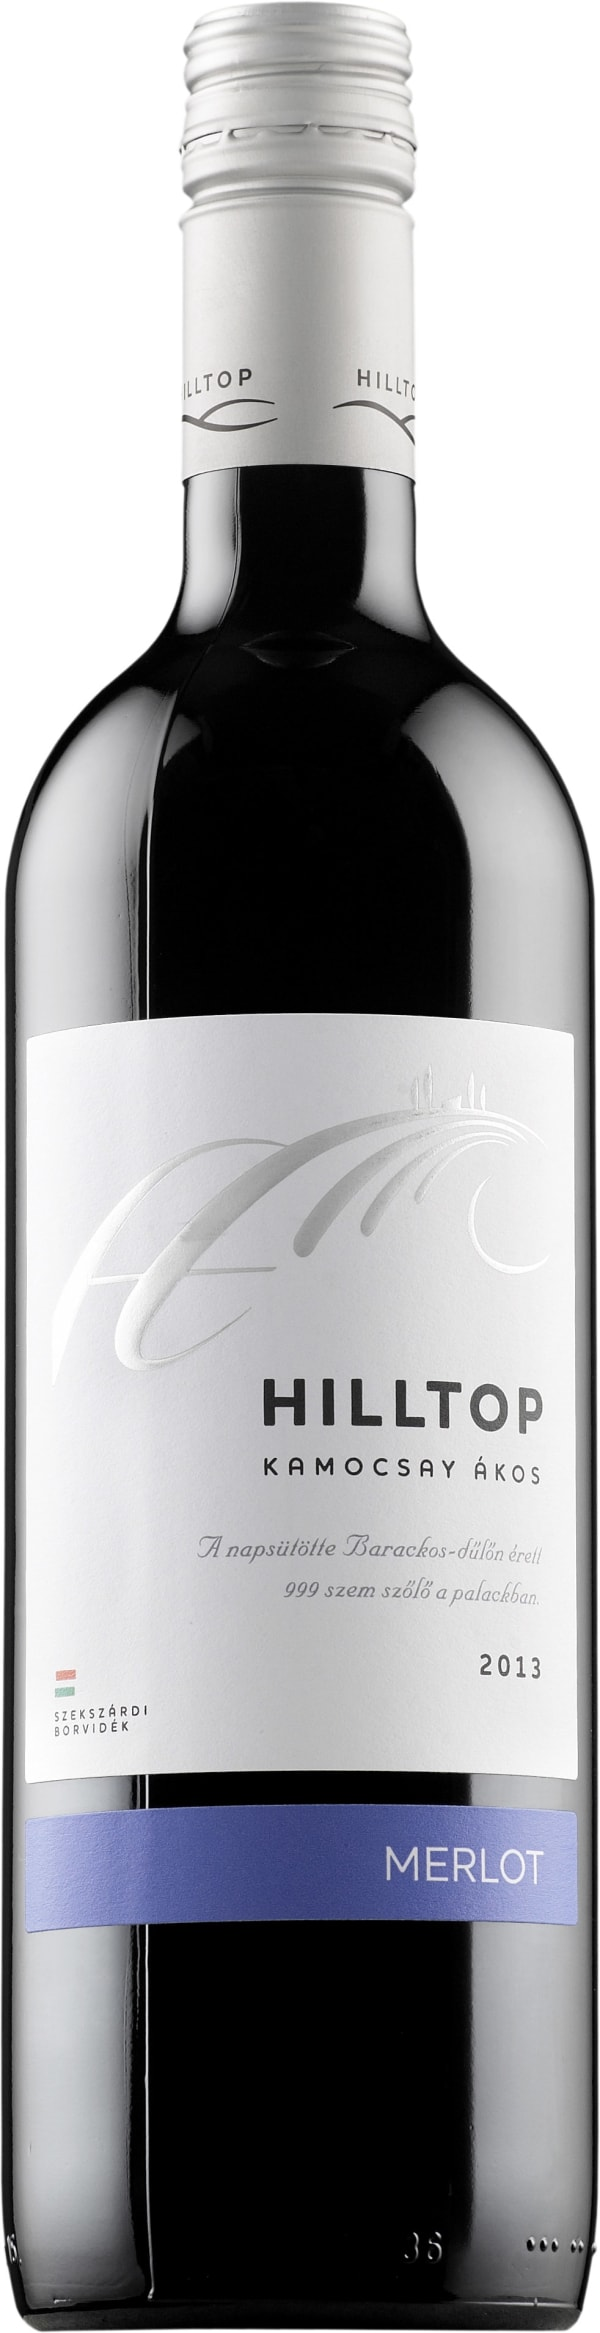 Hilltop Merlot 2013